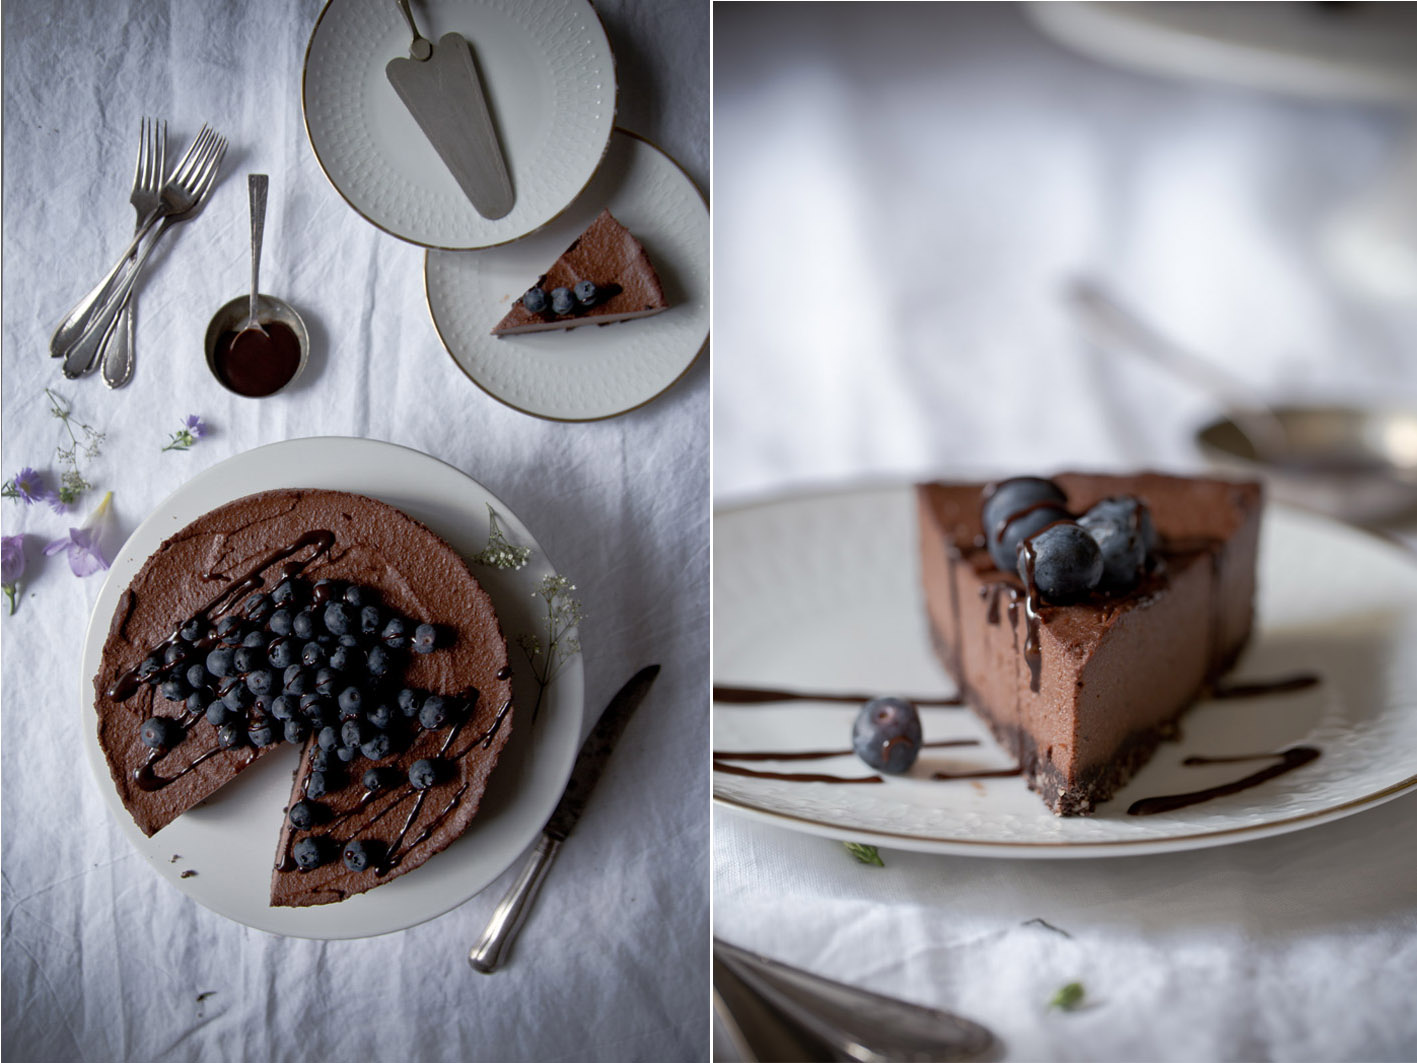 Schokoladen cheesecake angeschnitten